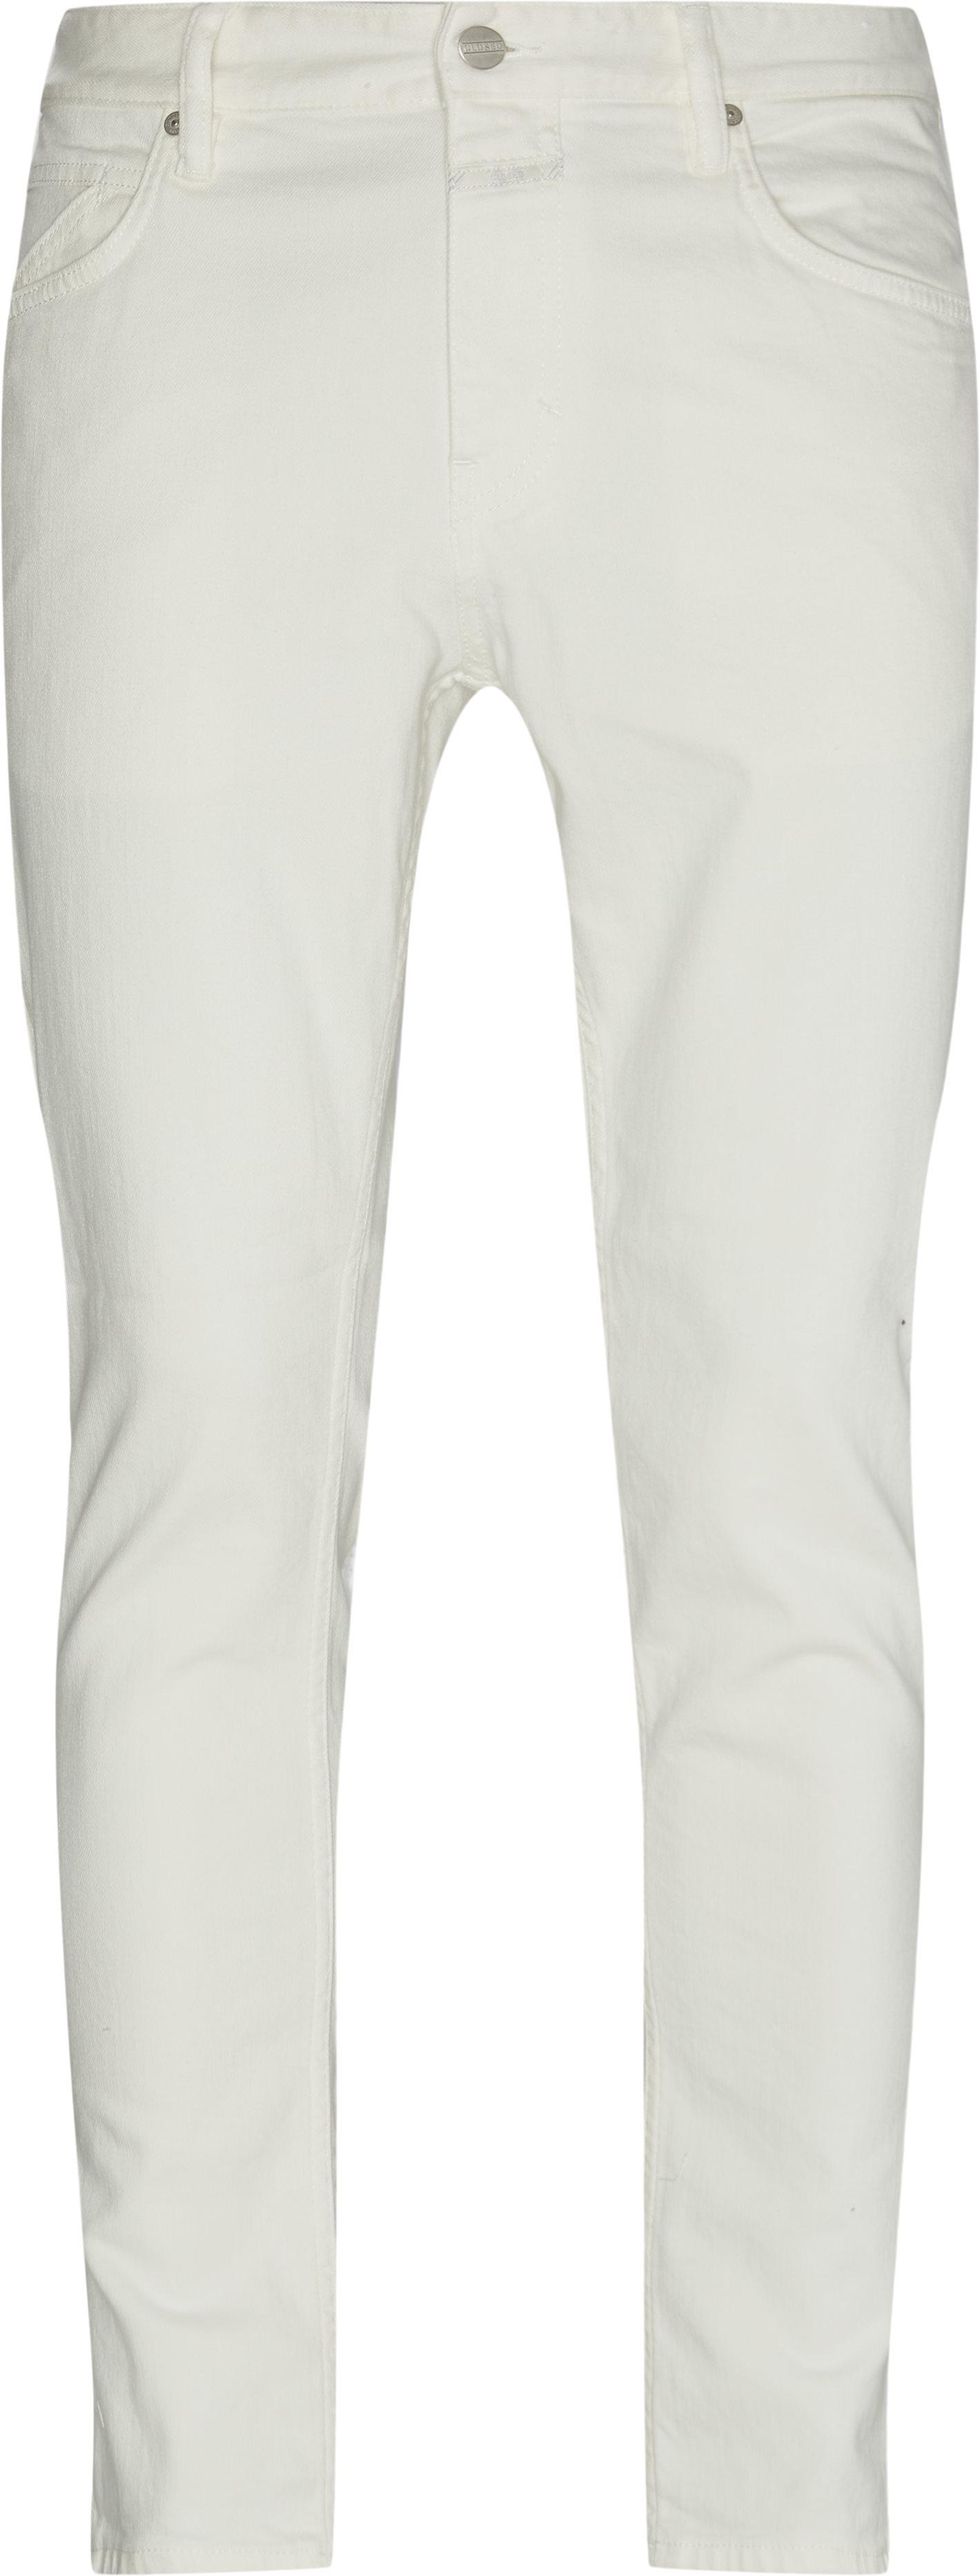 Jeans - Slim fit - Hvid